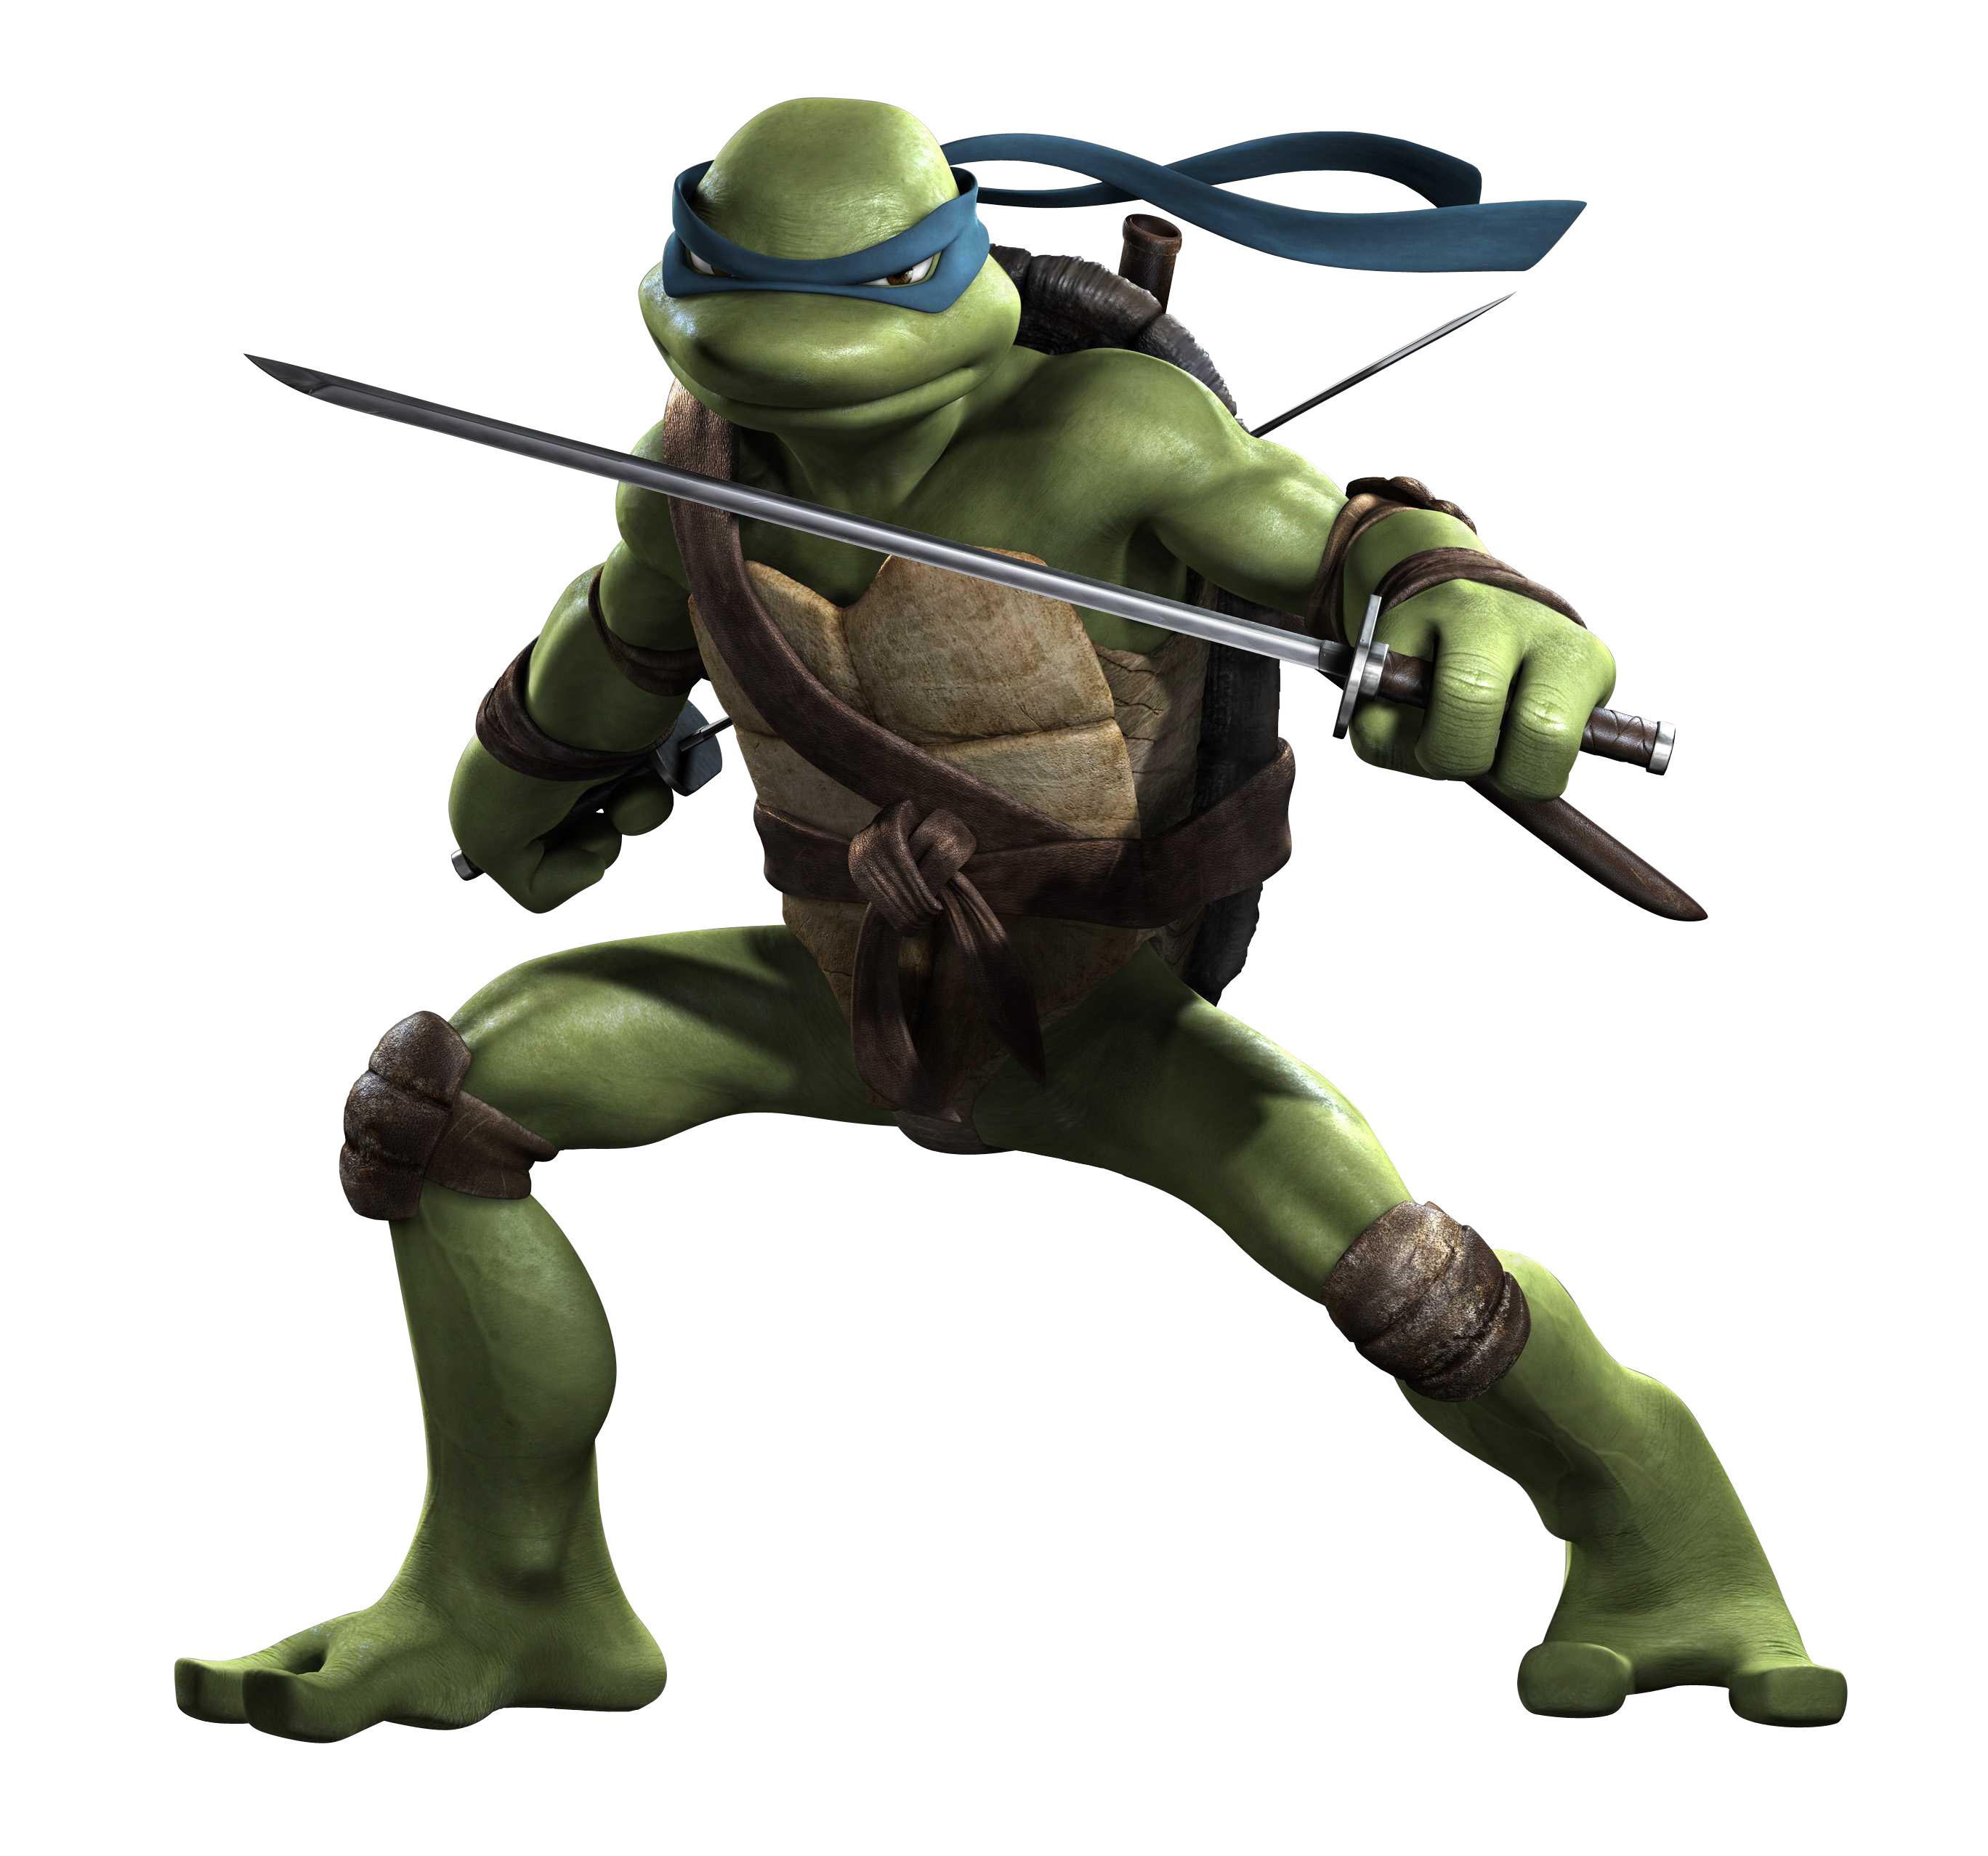 Datei:Leonardo.png